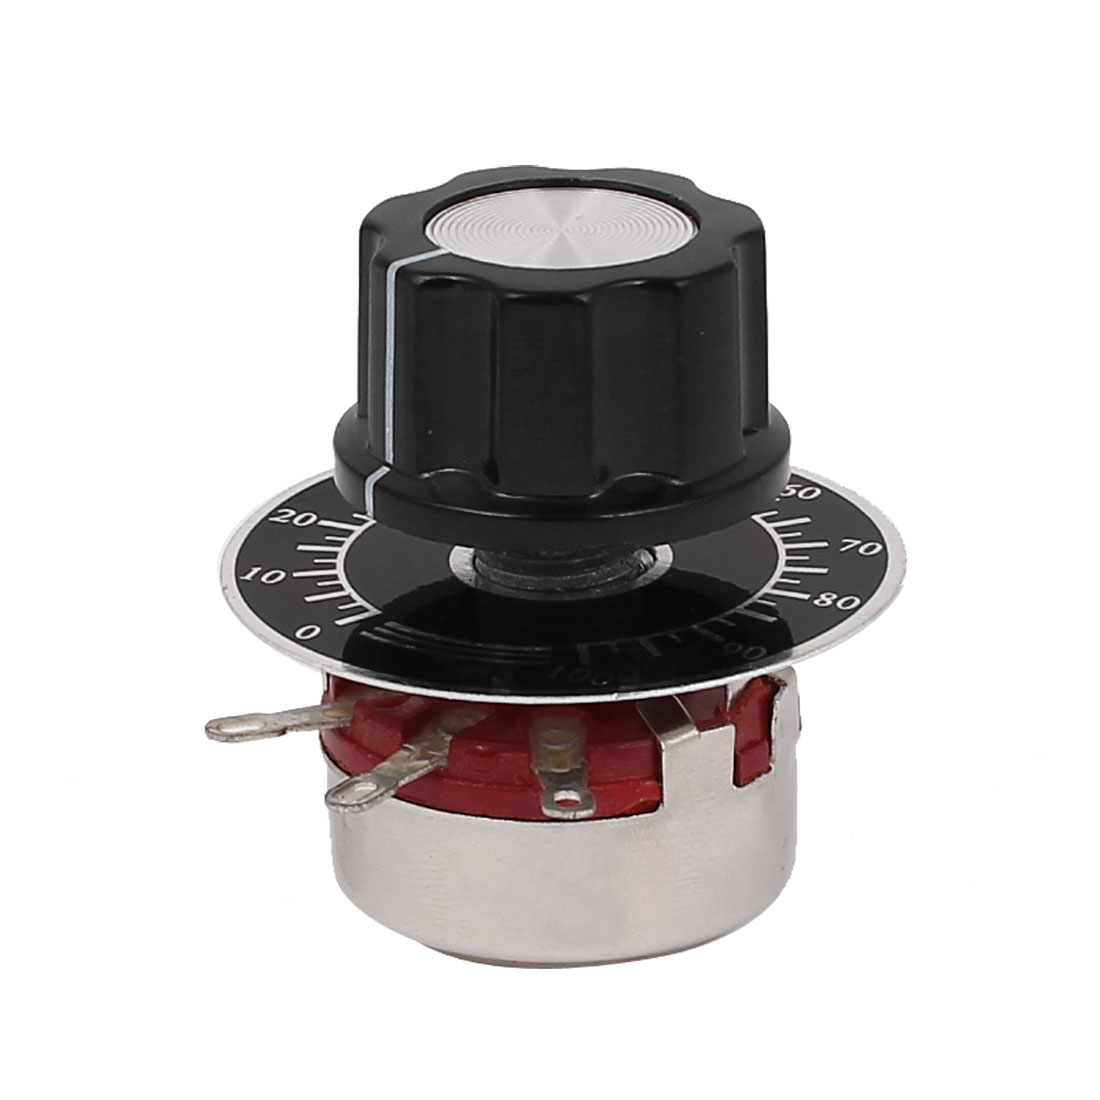 WTH118-1A 2W 4K7 Ohm Rotary Taper Carbon Film Potentiometer Pots w Dial w Knob